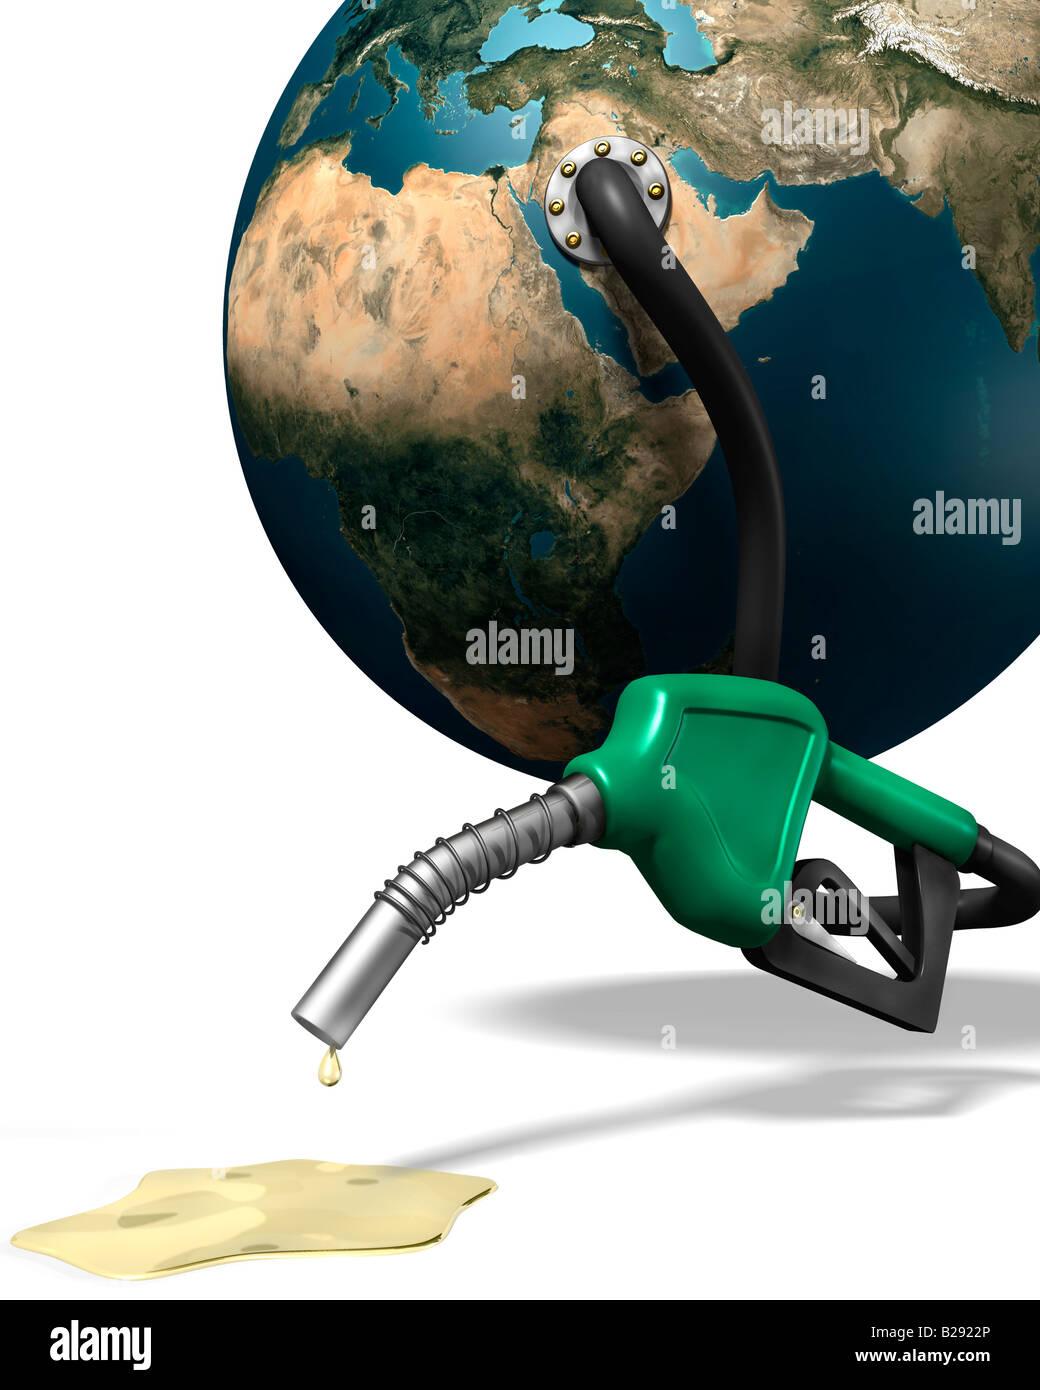 Benzin und Energie Krisenkonzept Stockbild